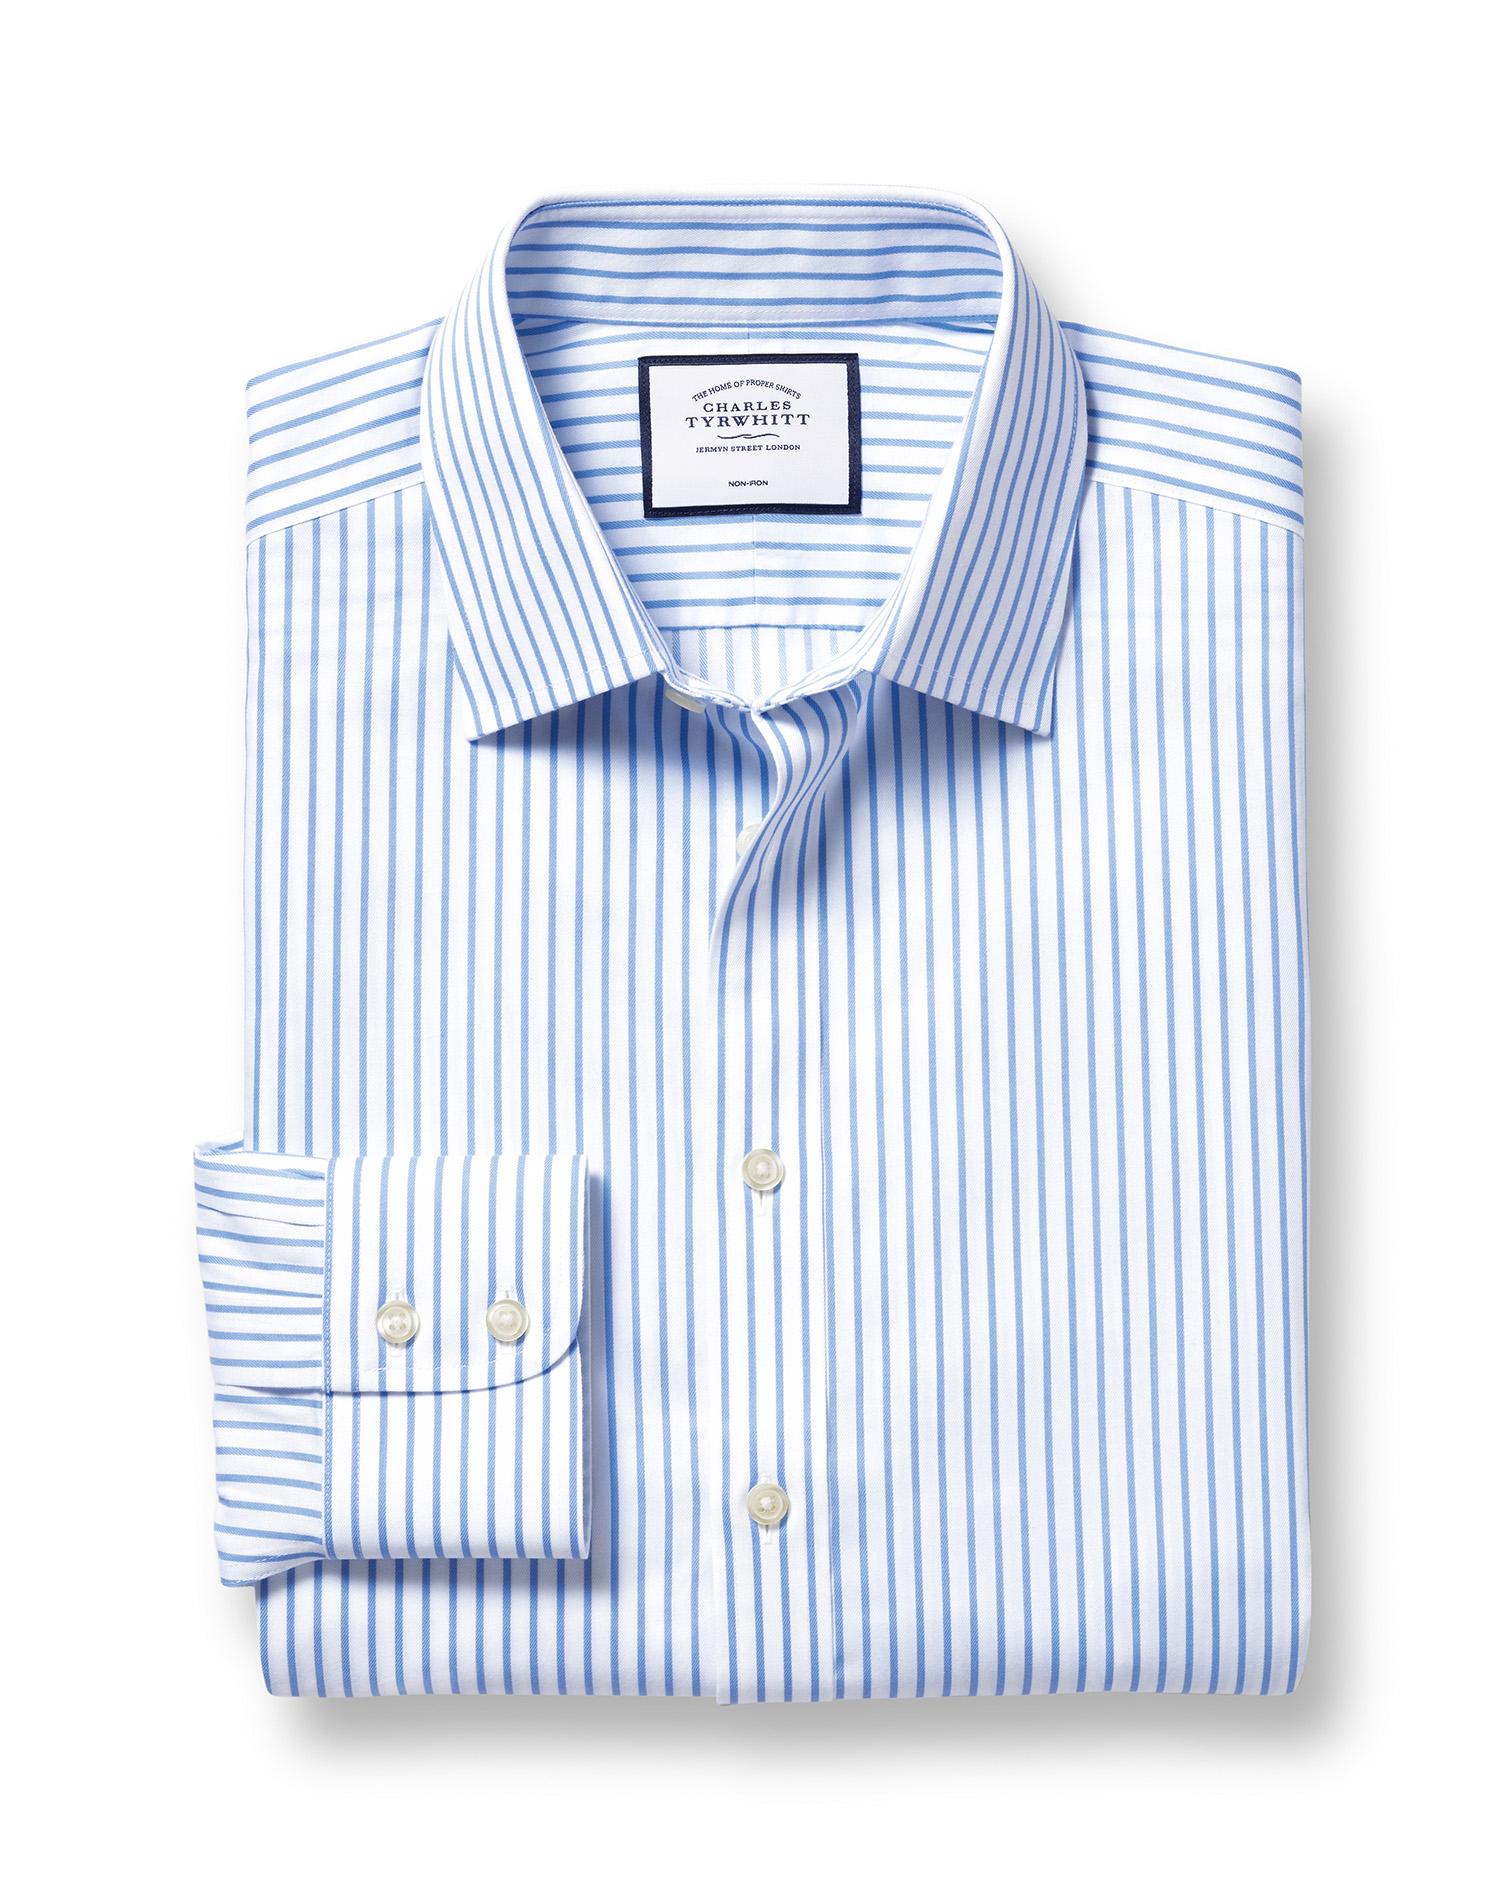 Slim Fit Non-Iron Sky Blue Stripe Twill Cotton Formal Shirt Single Cuff Size 15.5/37 by Charles Tyrw